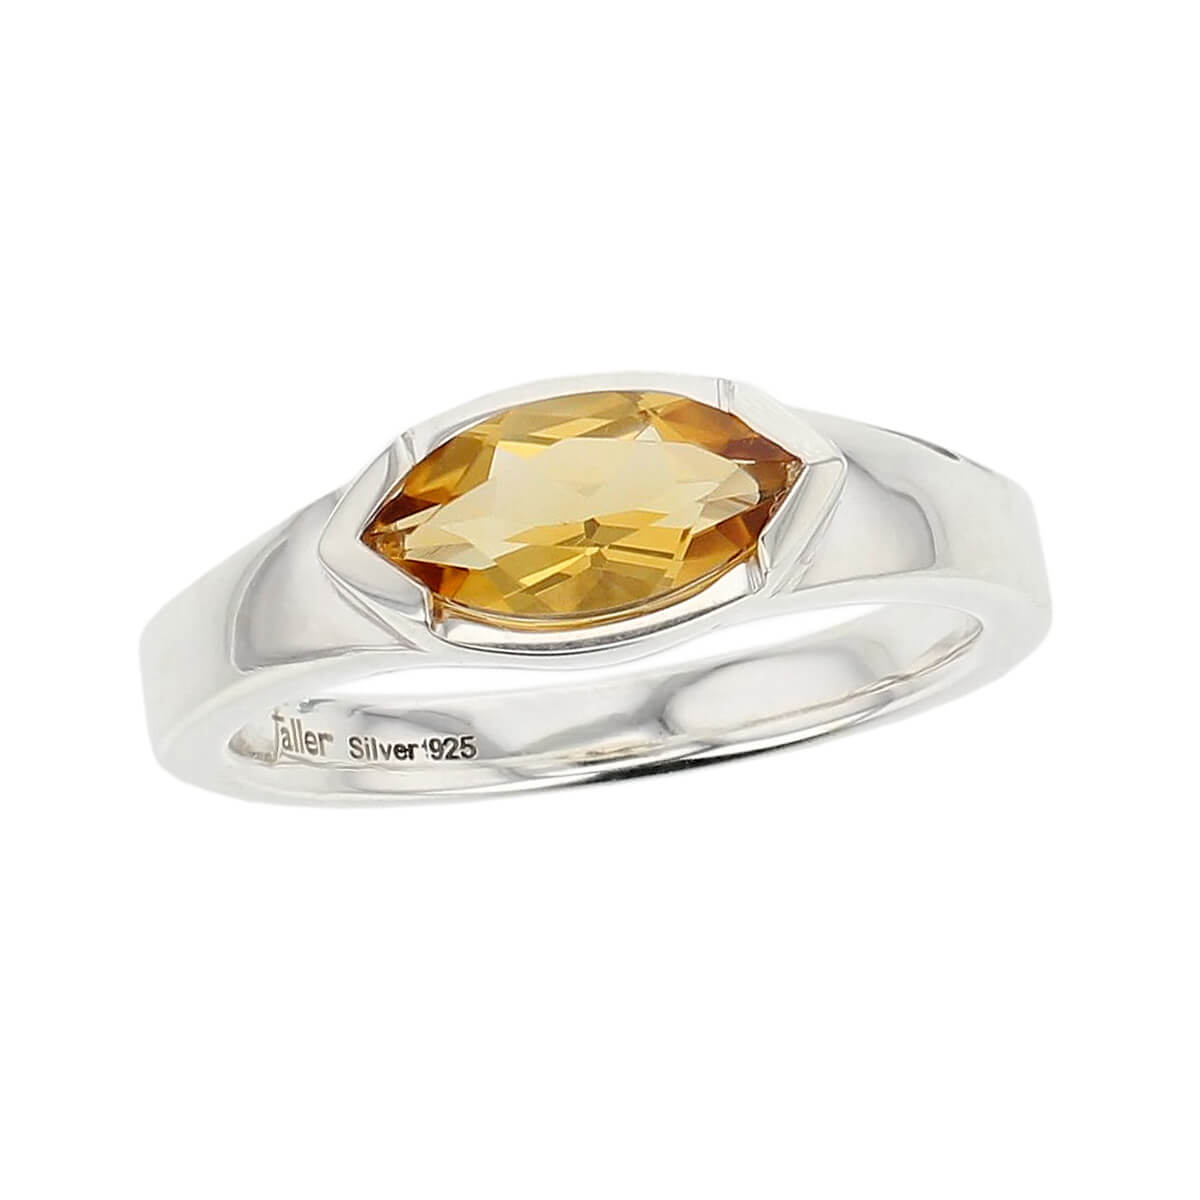 sterling silver yellow marquise cut citrine gemstone dress ring, designer jewellery, quartz gem, jewelry, handmade by Faller, Londonderry, Northern Ireland, Irish hand crafted, darcy, D'arcy, navette